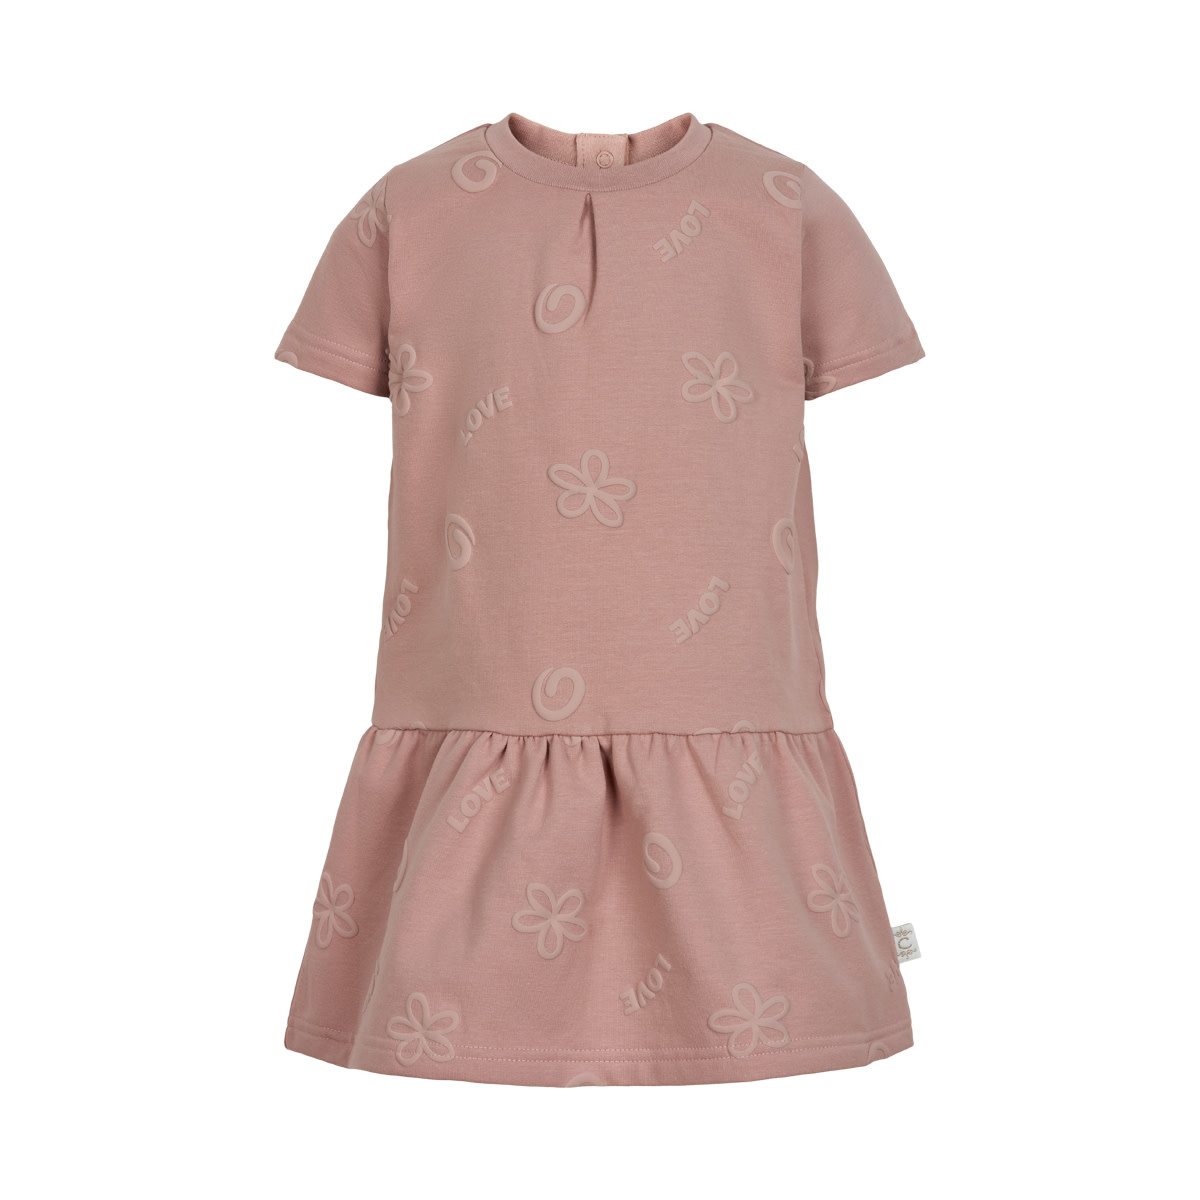 Sweater Dress - Adobe Rose